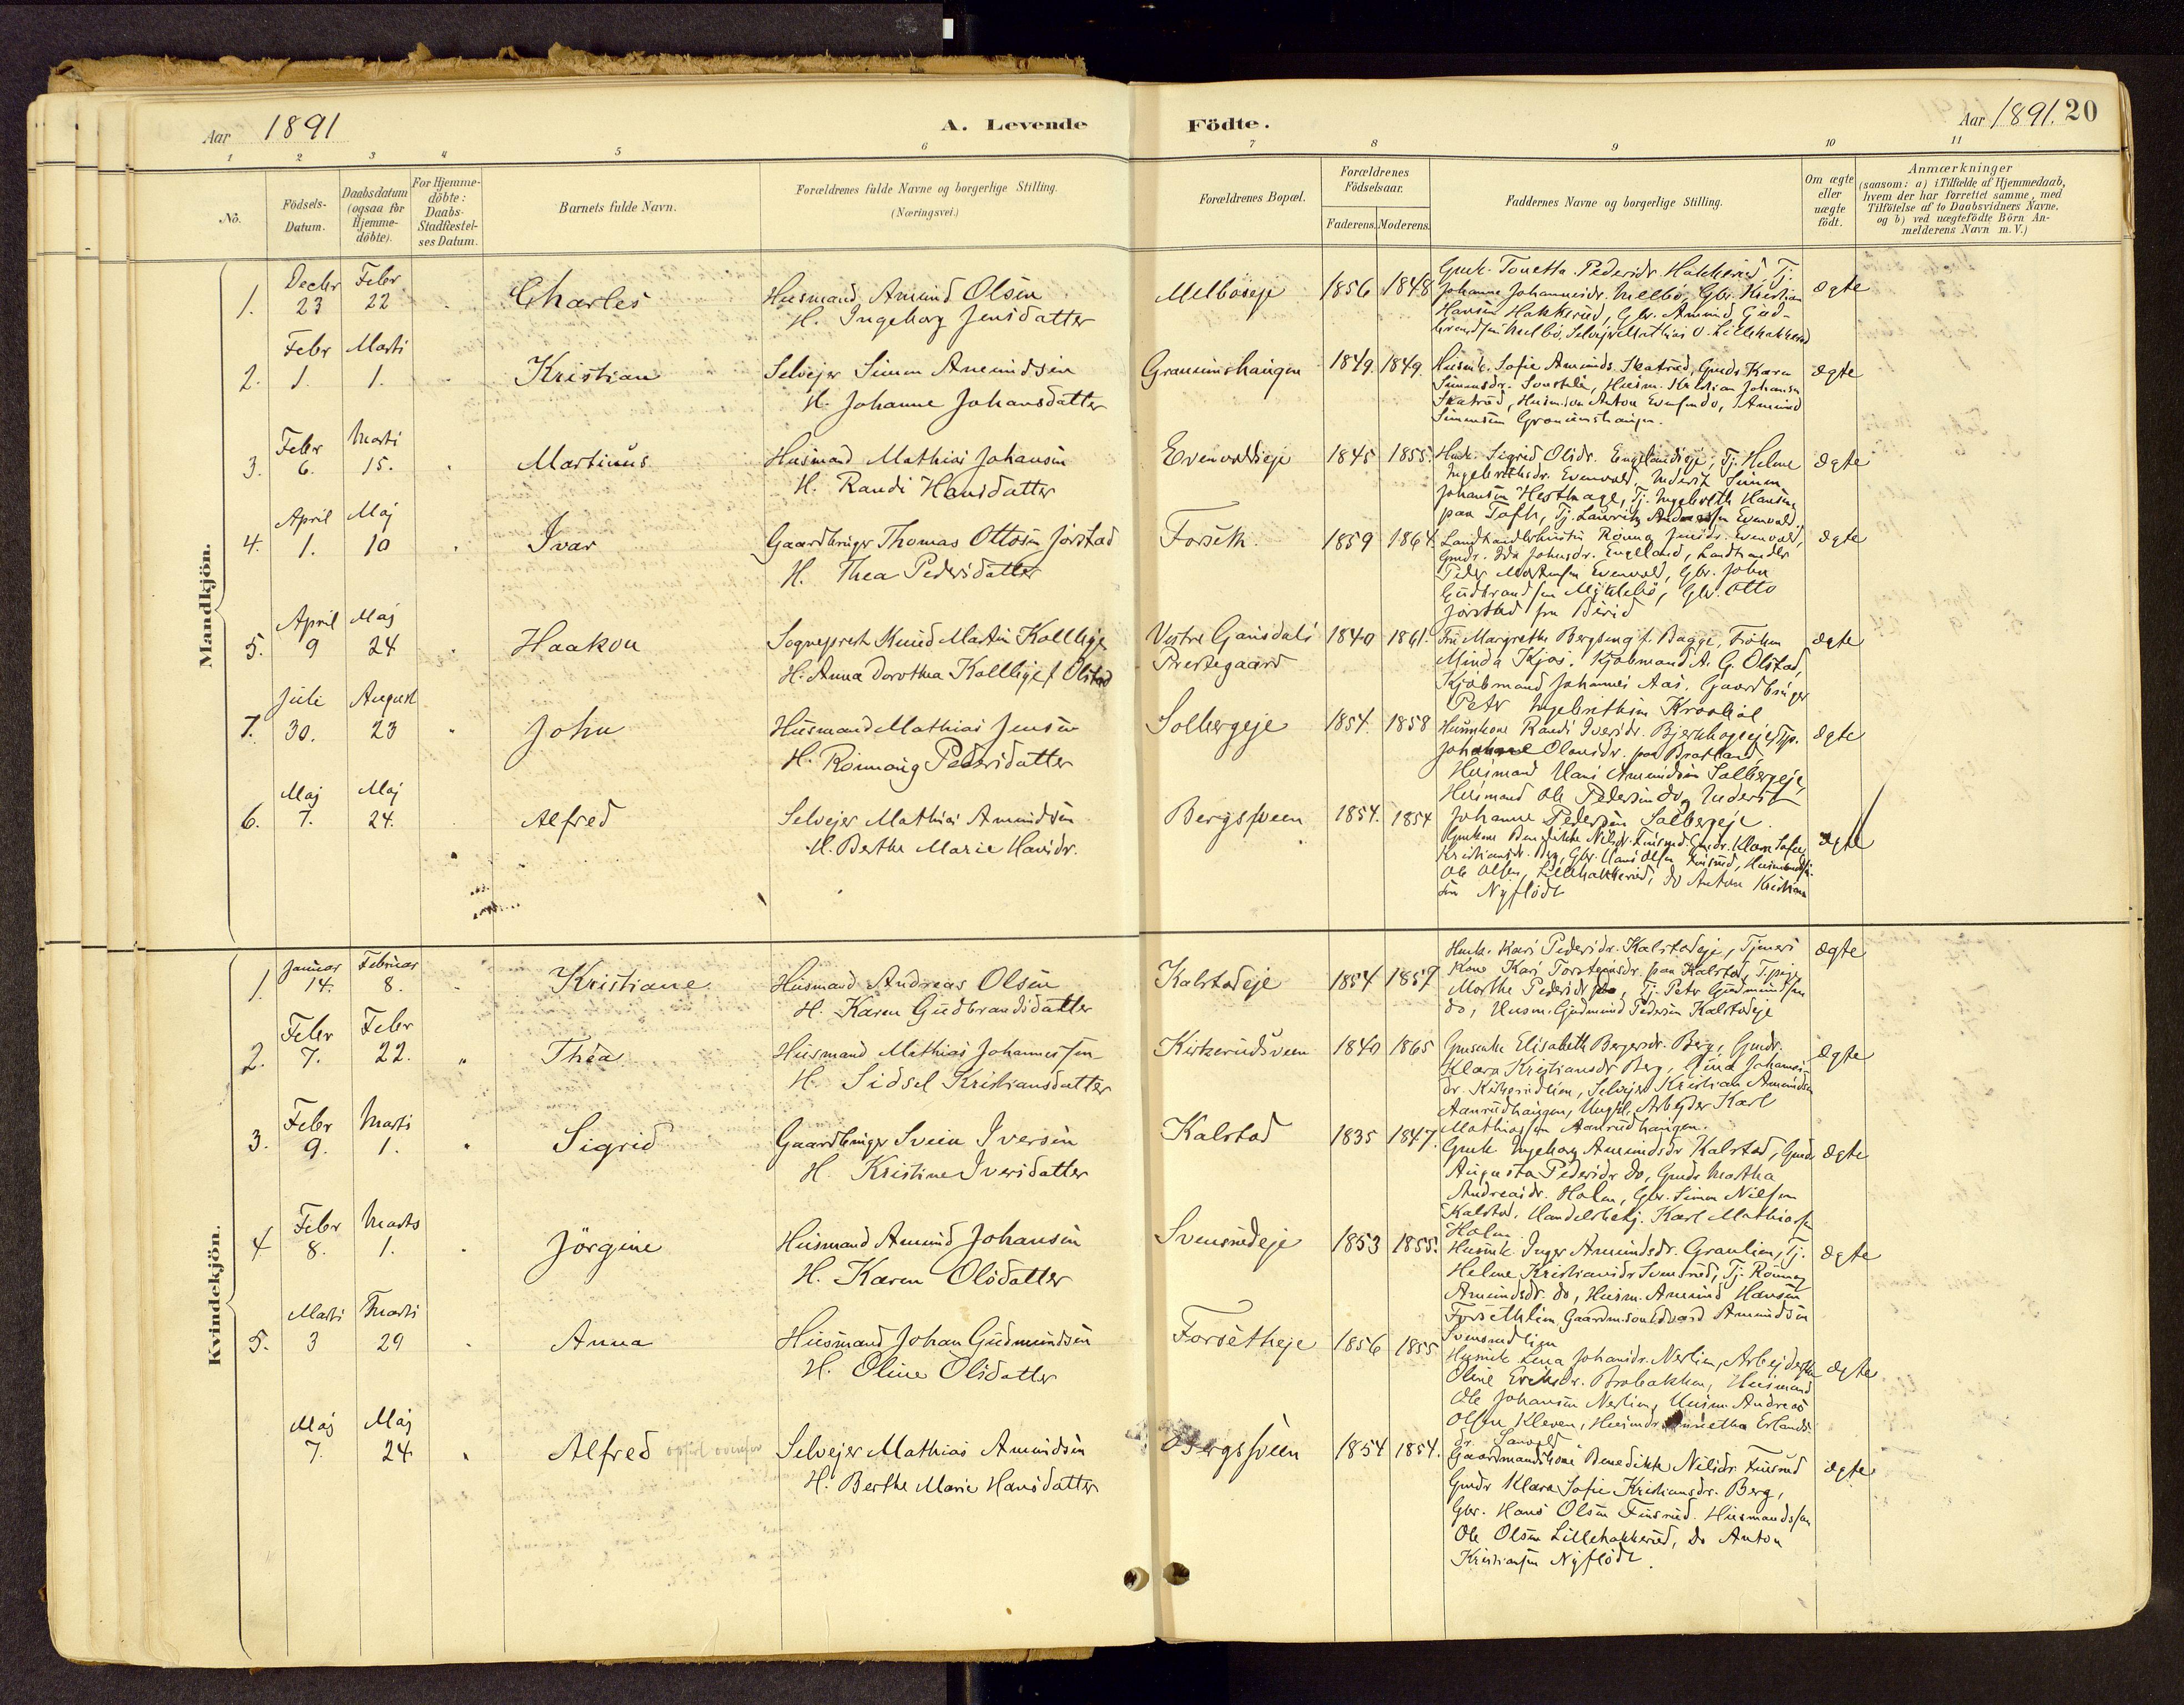 SAH, Vestre Gausdal prestekontor, Ministerialbok nr. 1, 1887-1914, s. 20